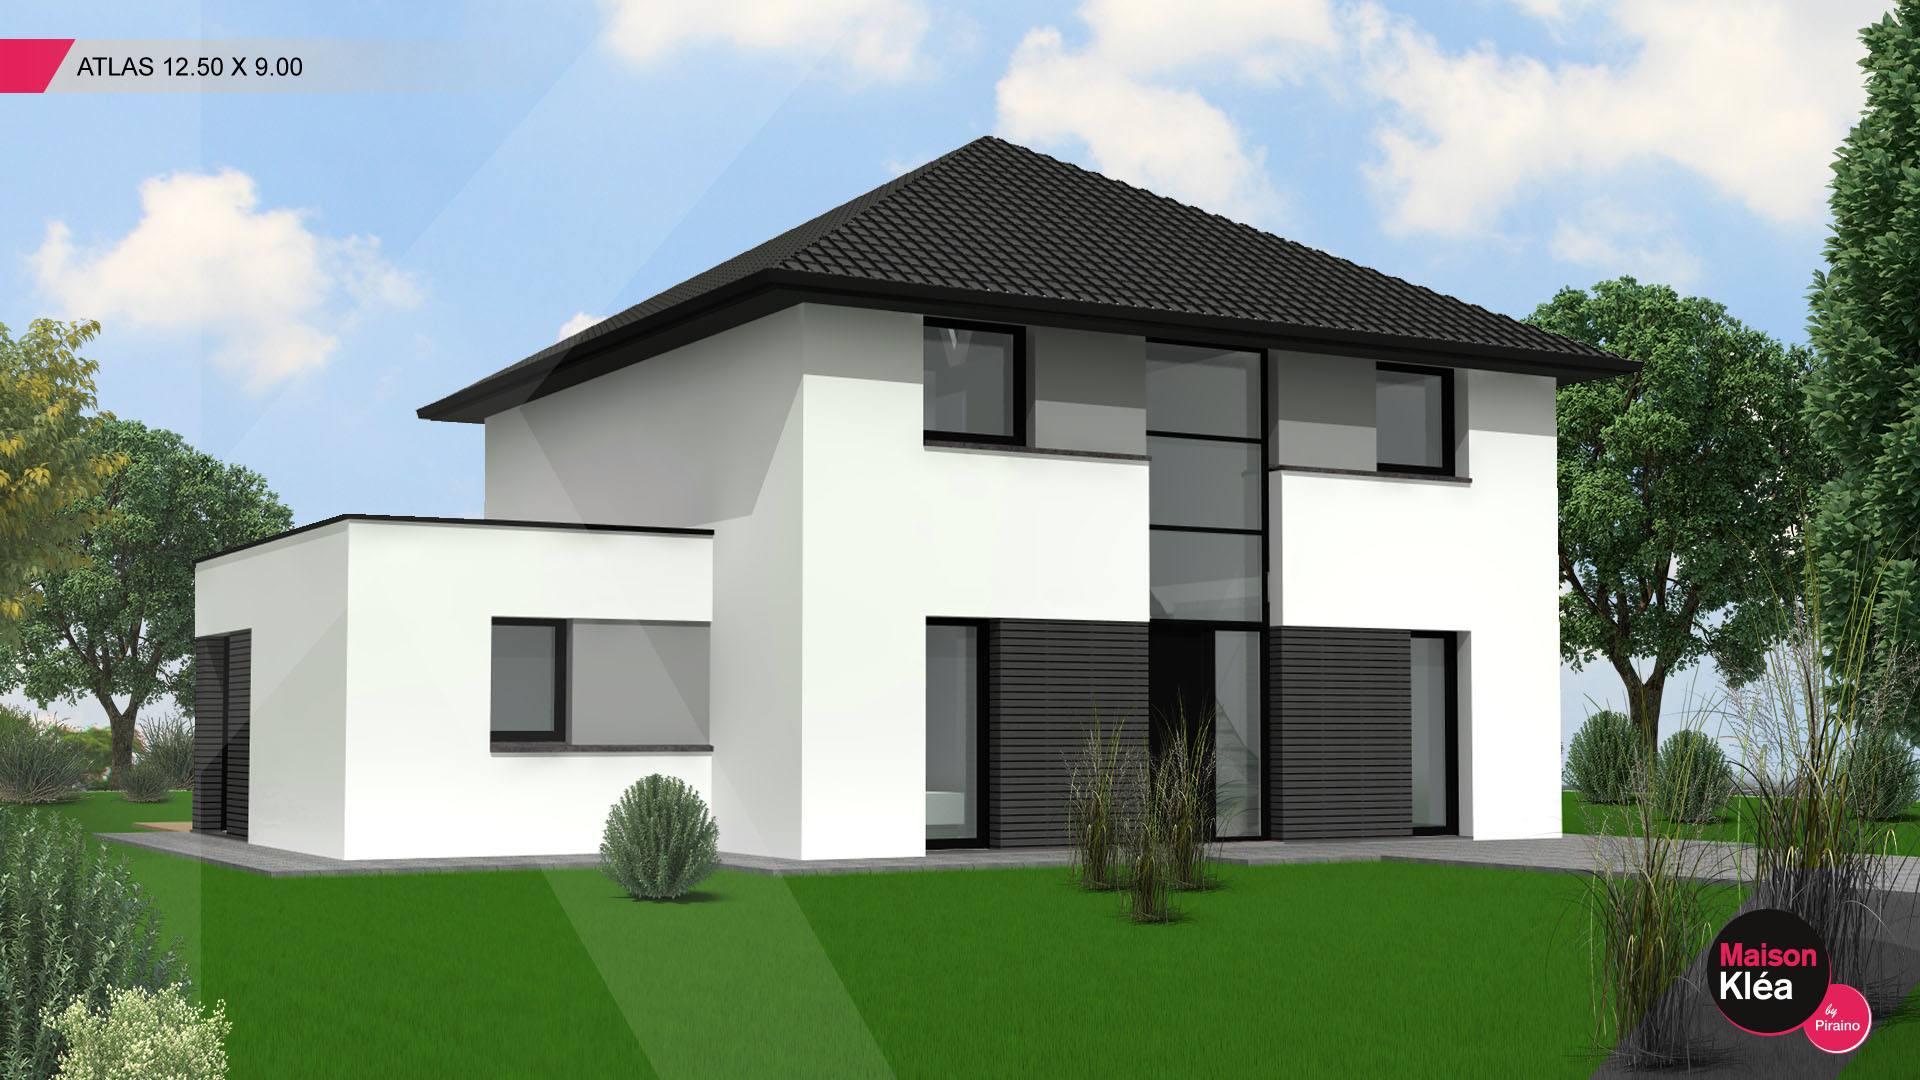 Terrain + Projet de construction Piraino